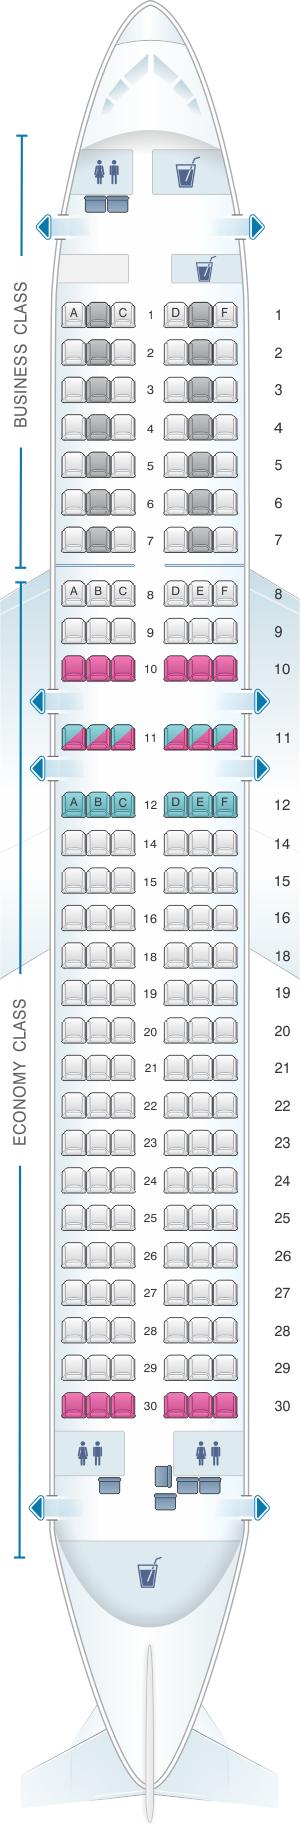 Seat Map Lufthansa Airbus A320